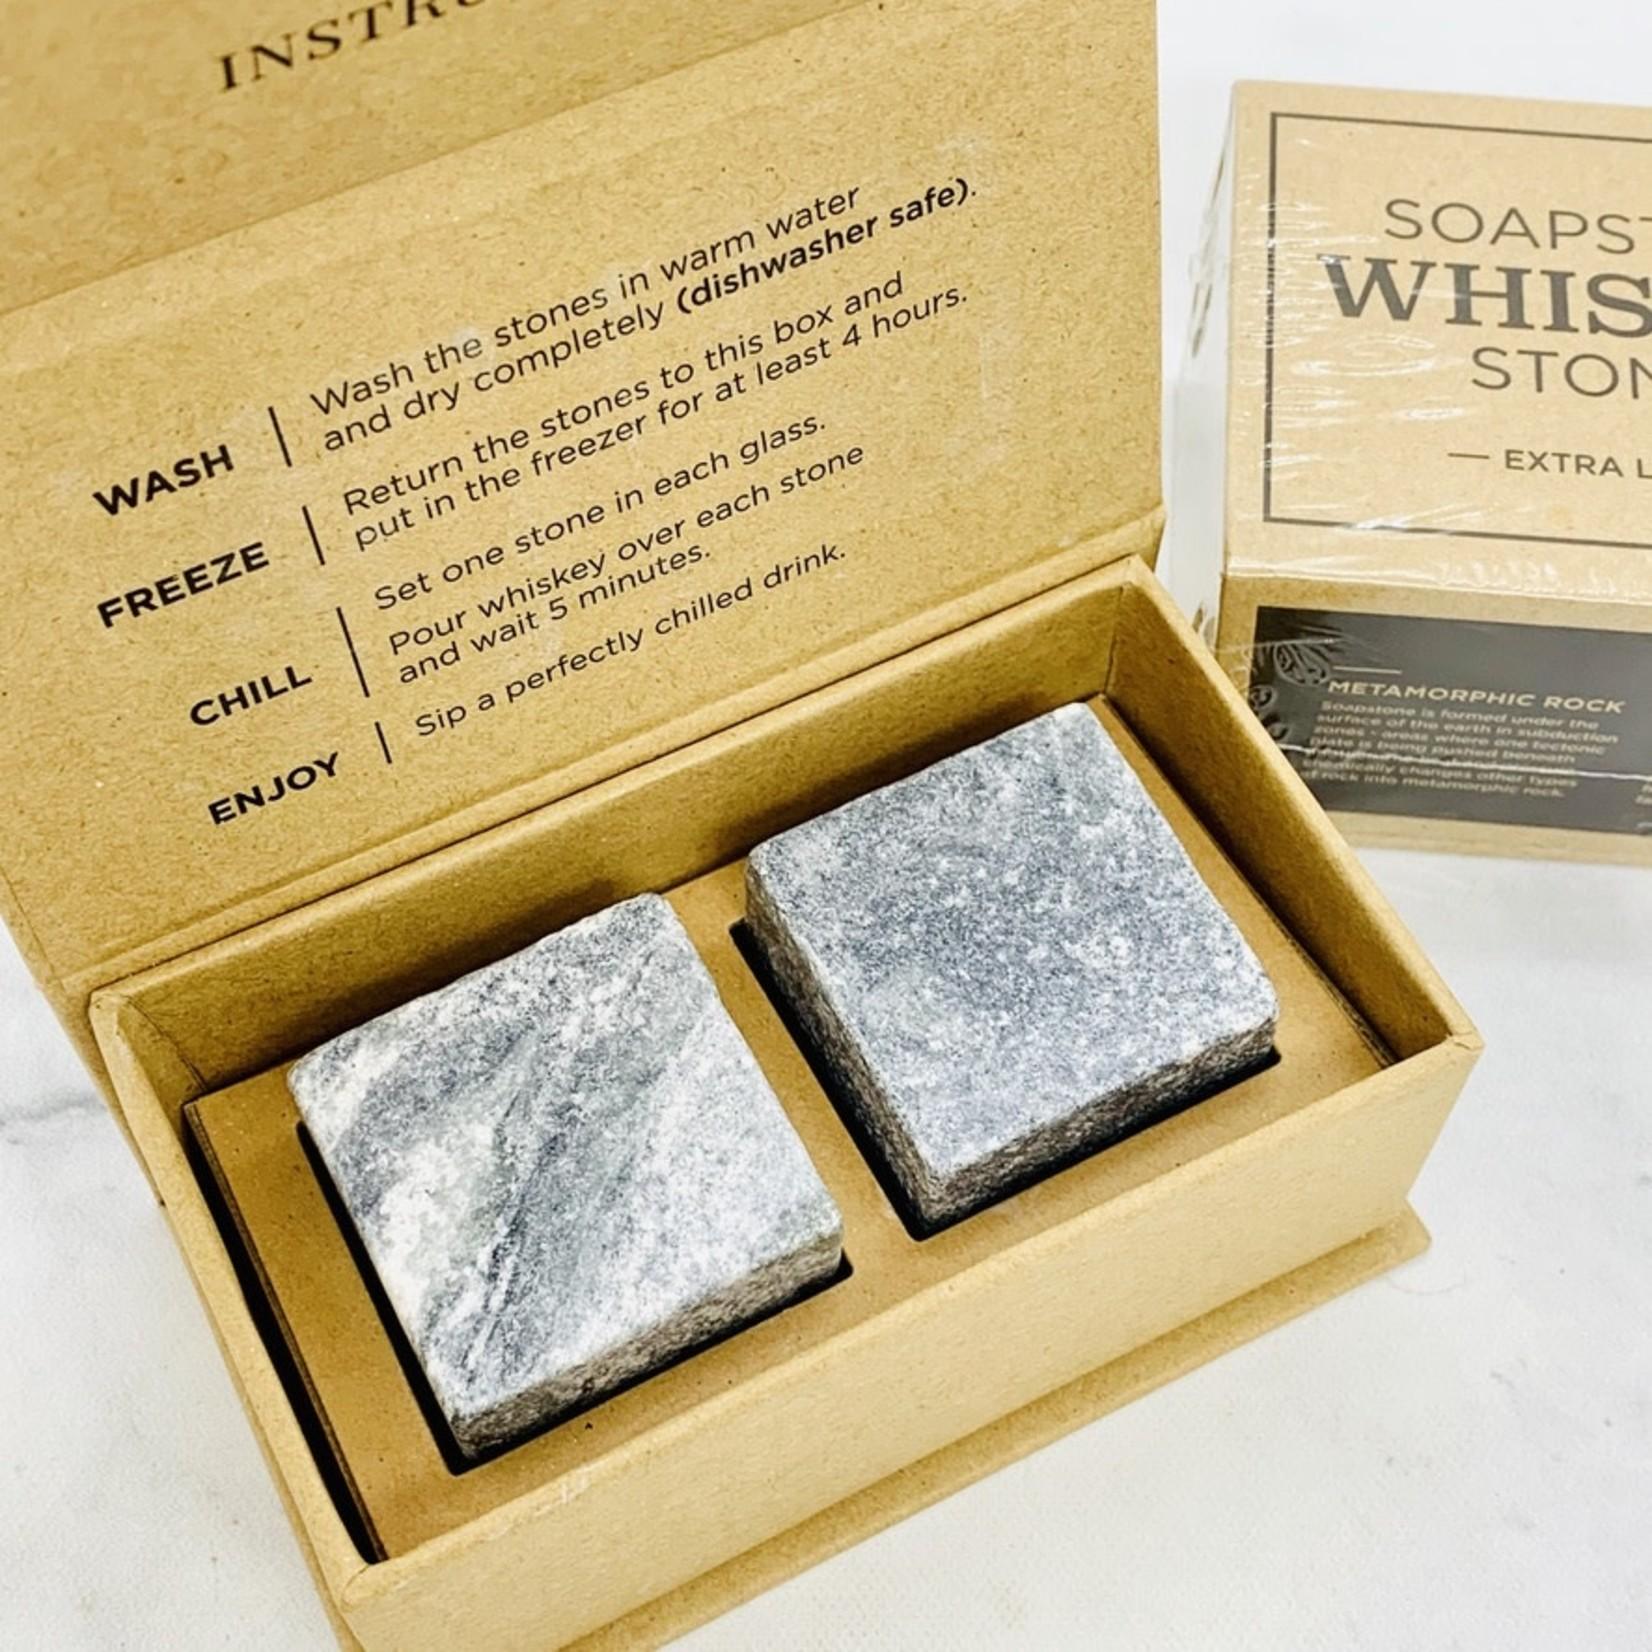 Cognitive Surplus Mega Rocks Soapstone Whiskey Stones